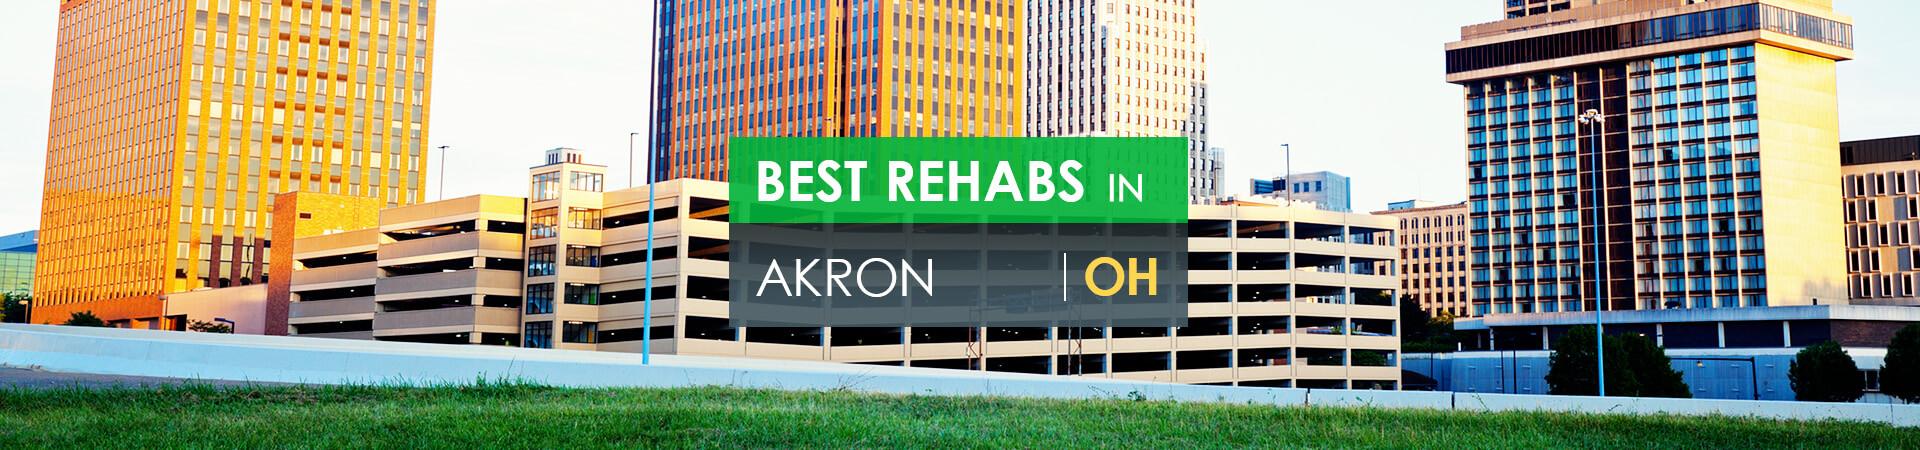 Best rehabs in Akron, OH